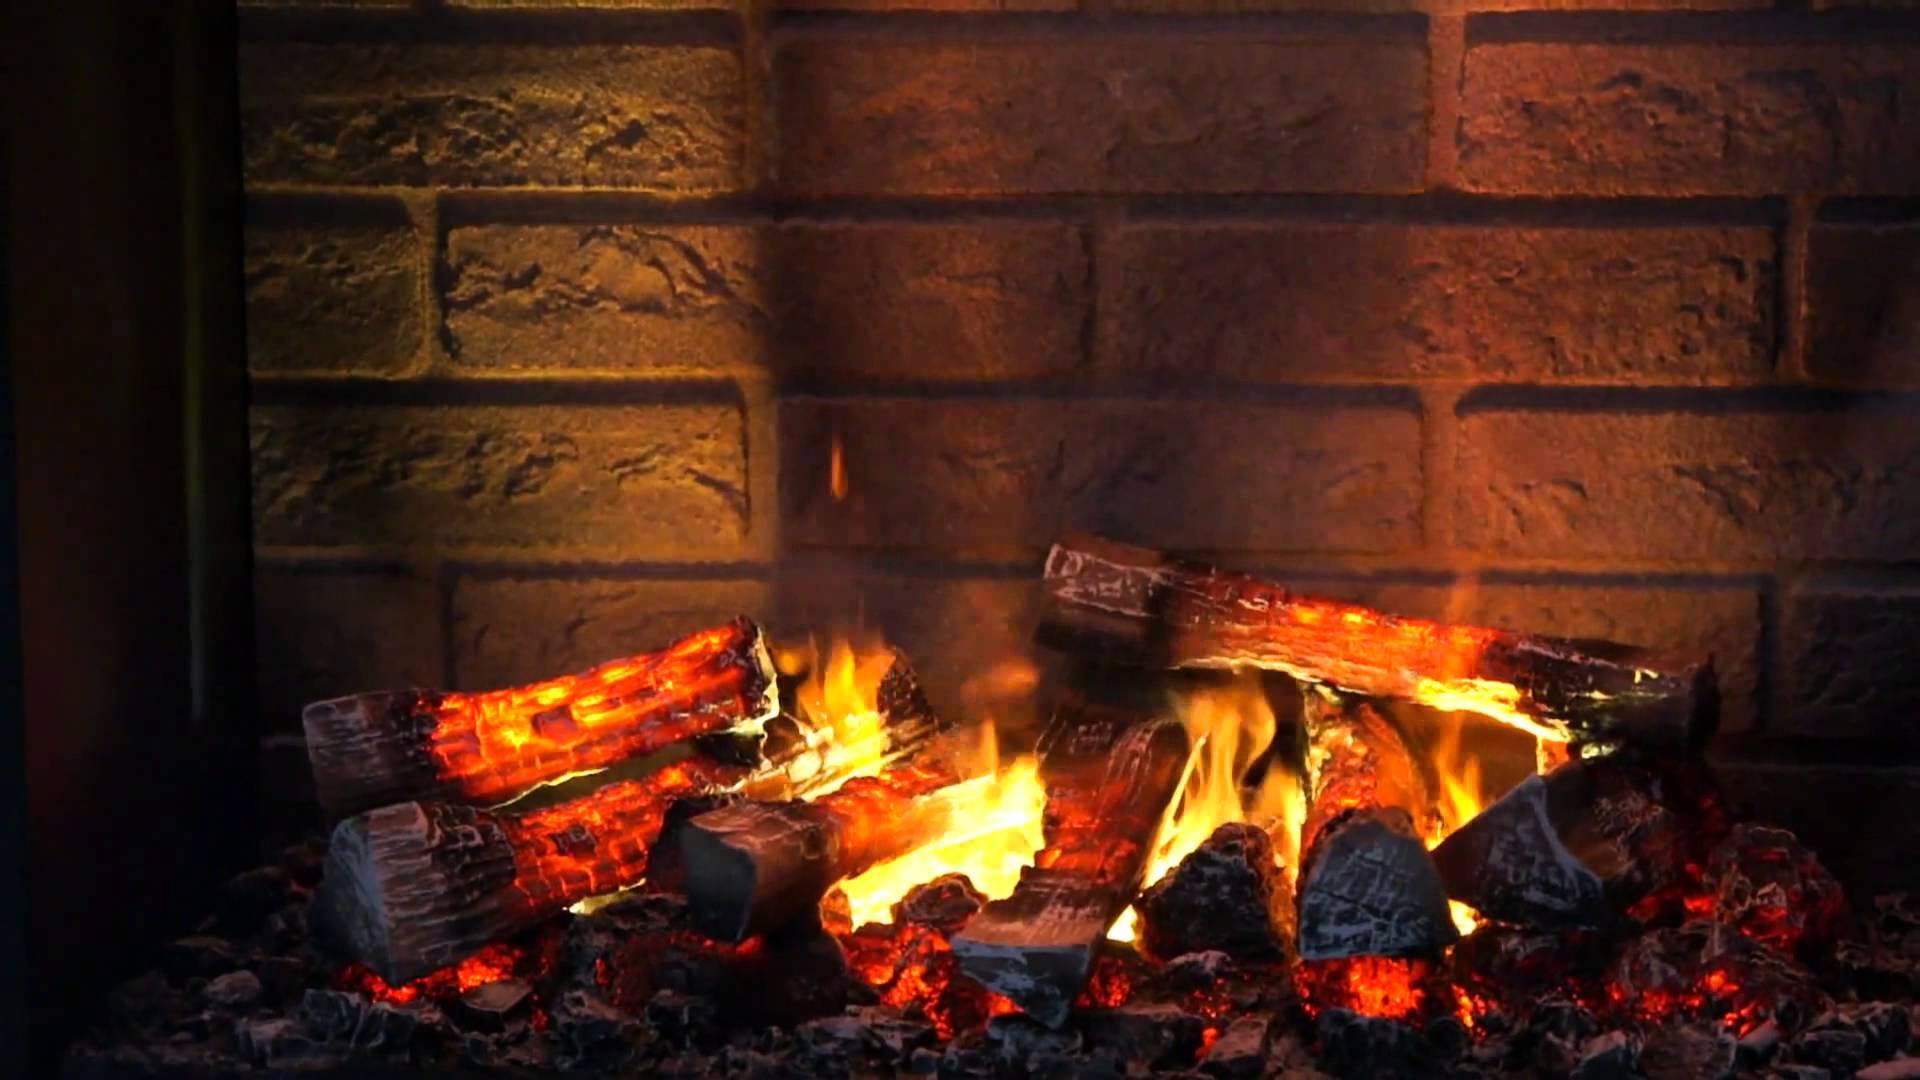 fireplace firewood flicker flame christmas - HD1920×1080